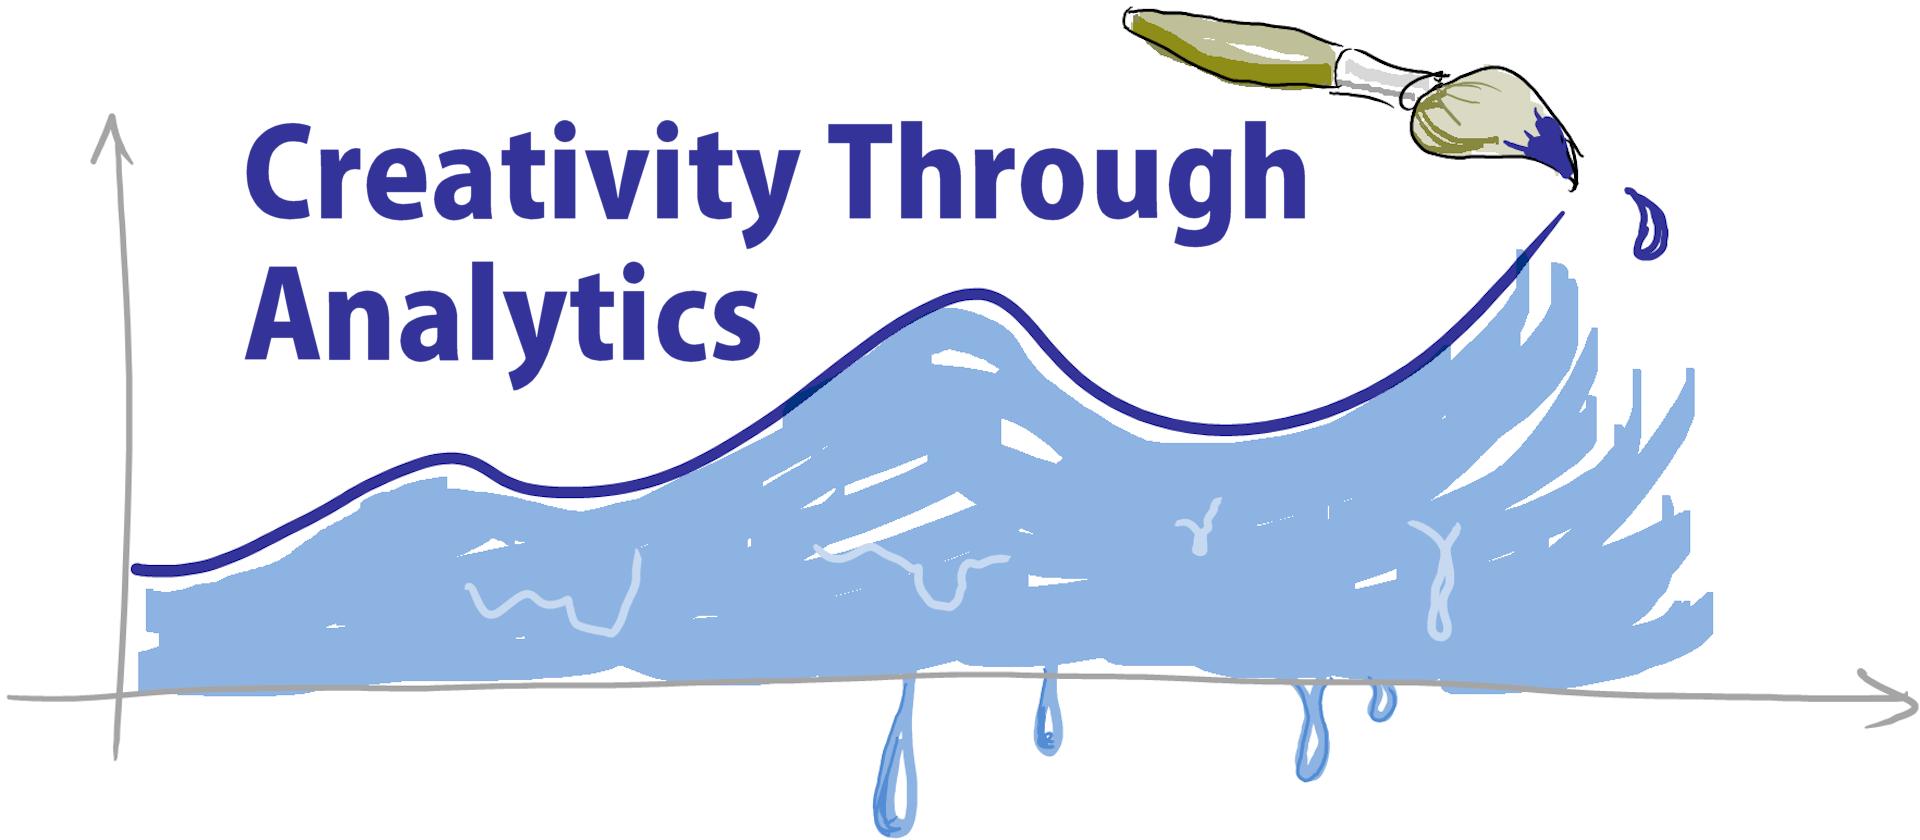 creativity through analytics